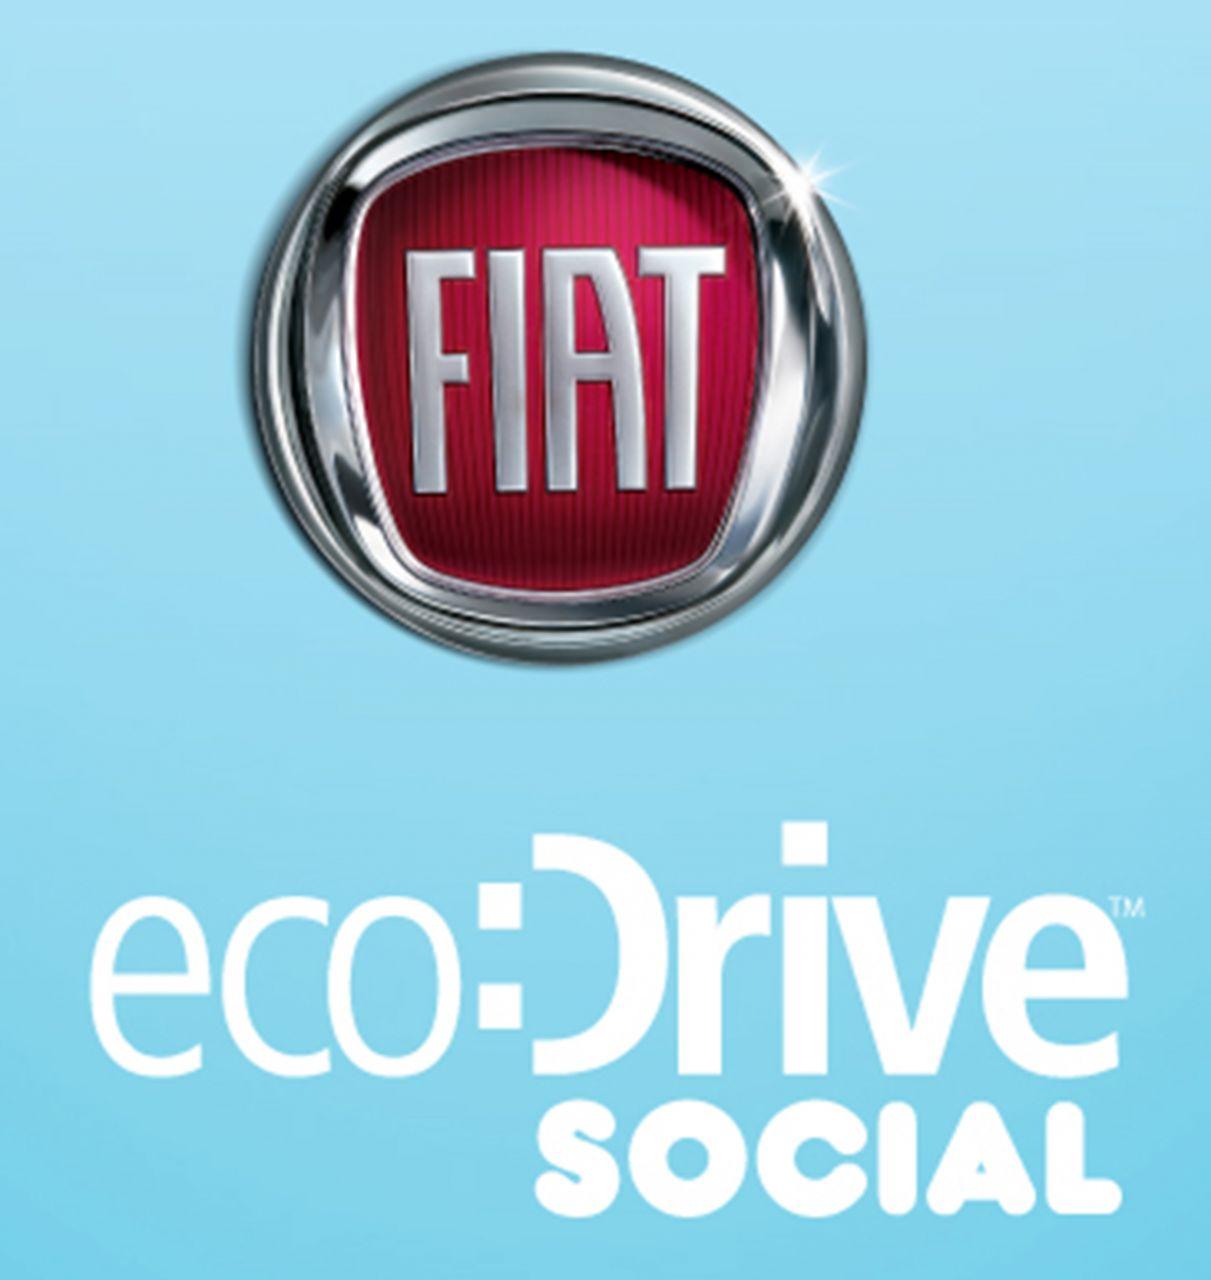 Spritspar-Initiative eco:Drive via Facebook und Twitter